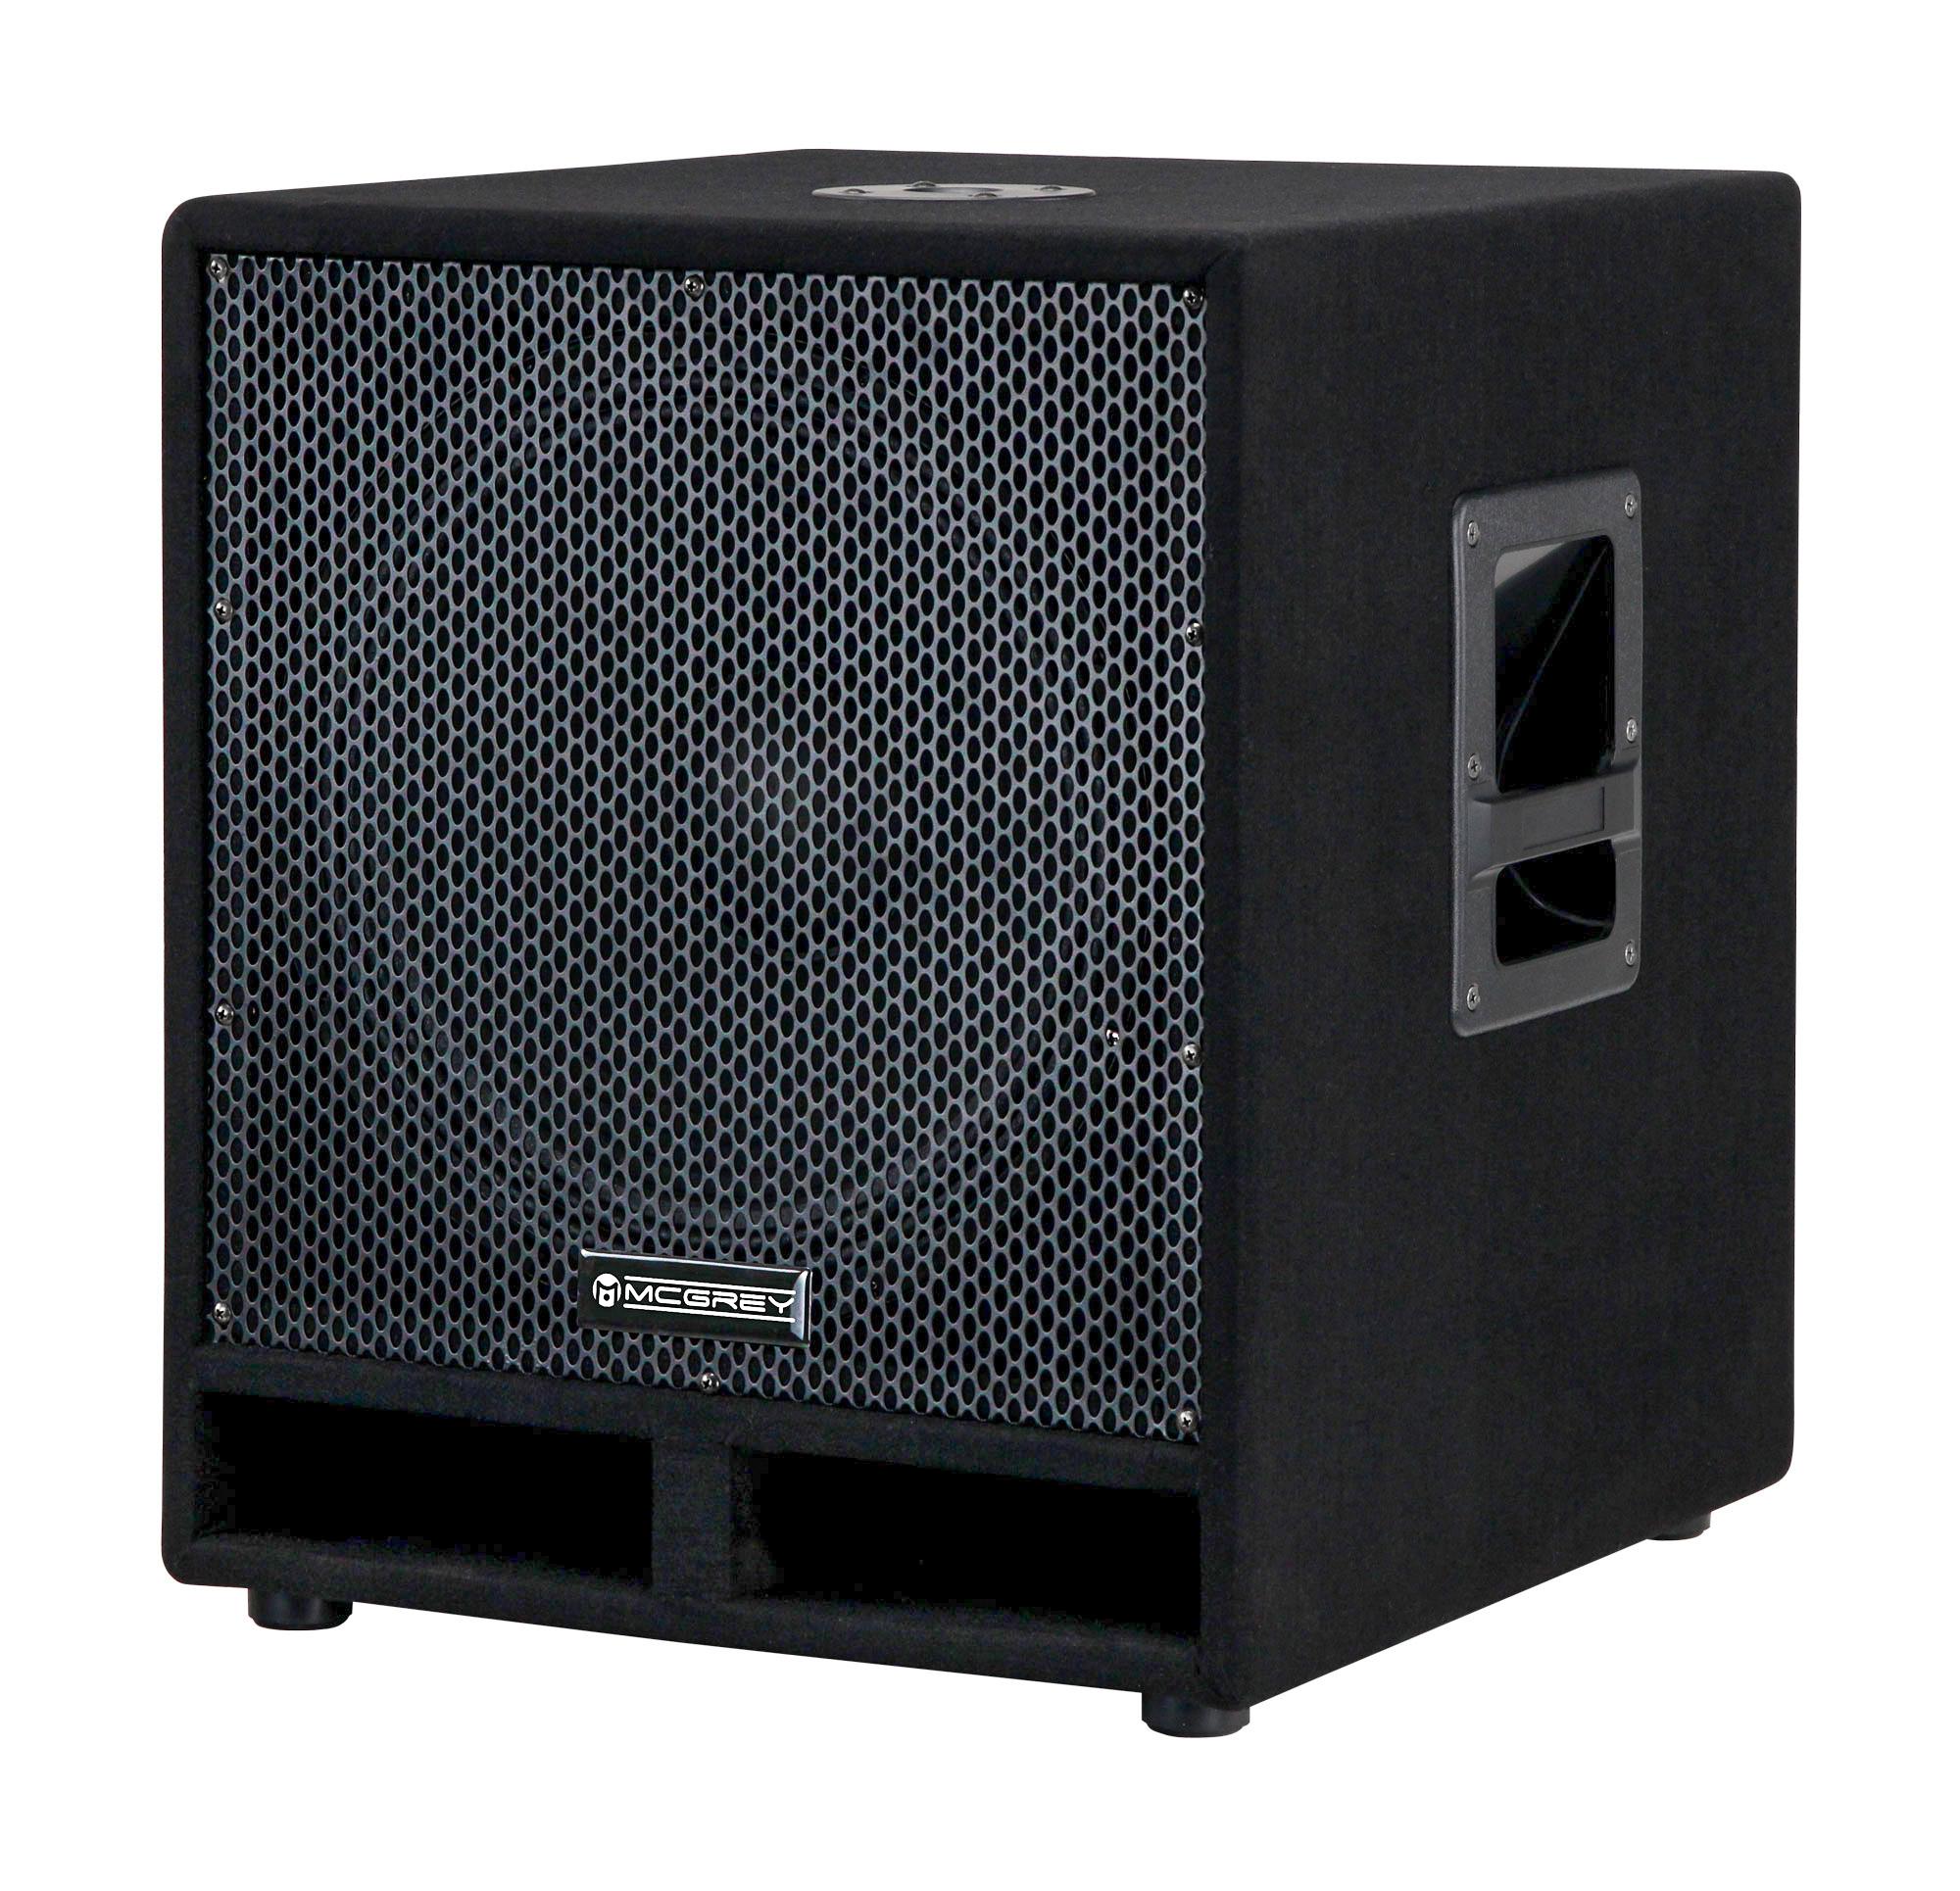 mcgrey pas 115 15 passiver pa subwoofer bass lautsprecher box 1200 watt retoure zustand gut. Black Bedroom Furniture Sets. Home Design Ideas